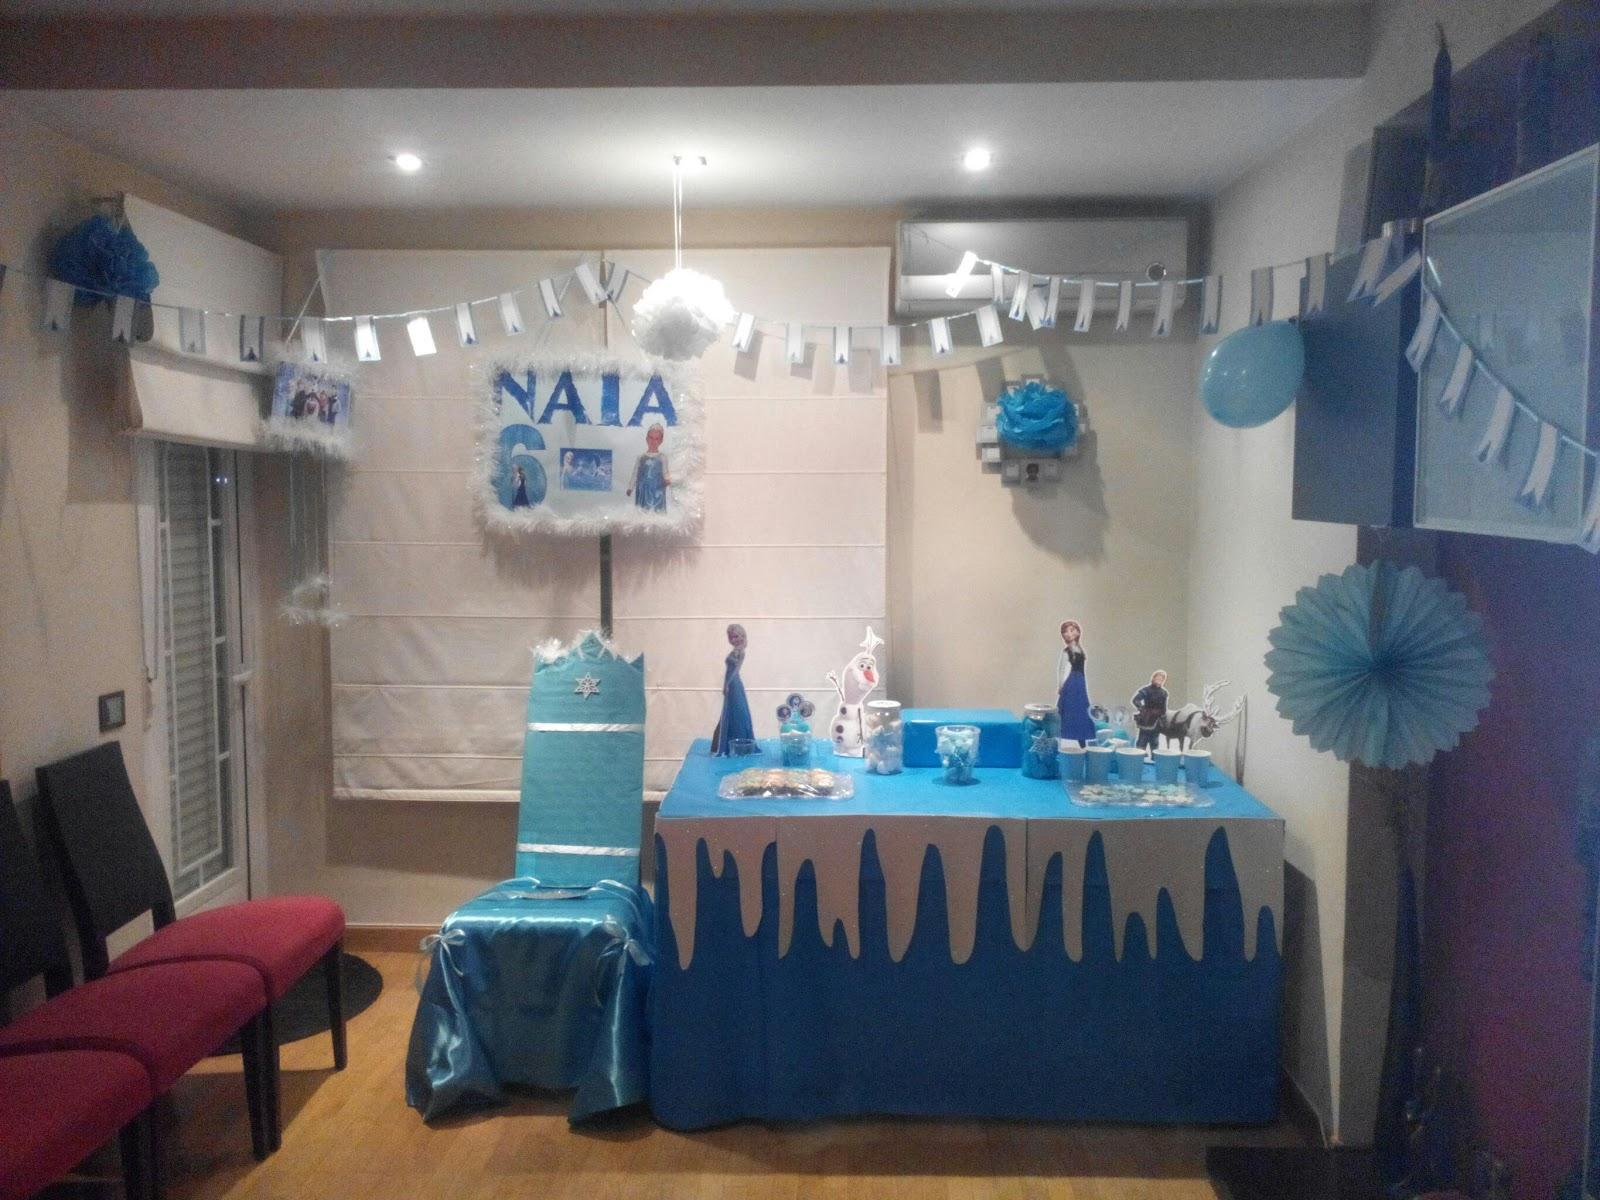 Decoracion casera para fiestas decoracin fiesta frozen - Decoracion fiesta ibicenca casera ...